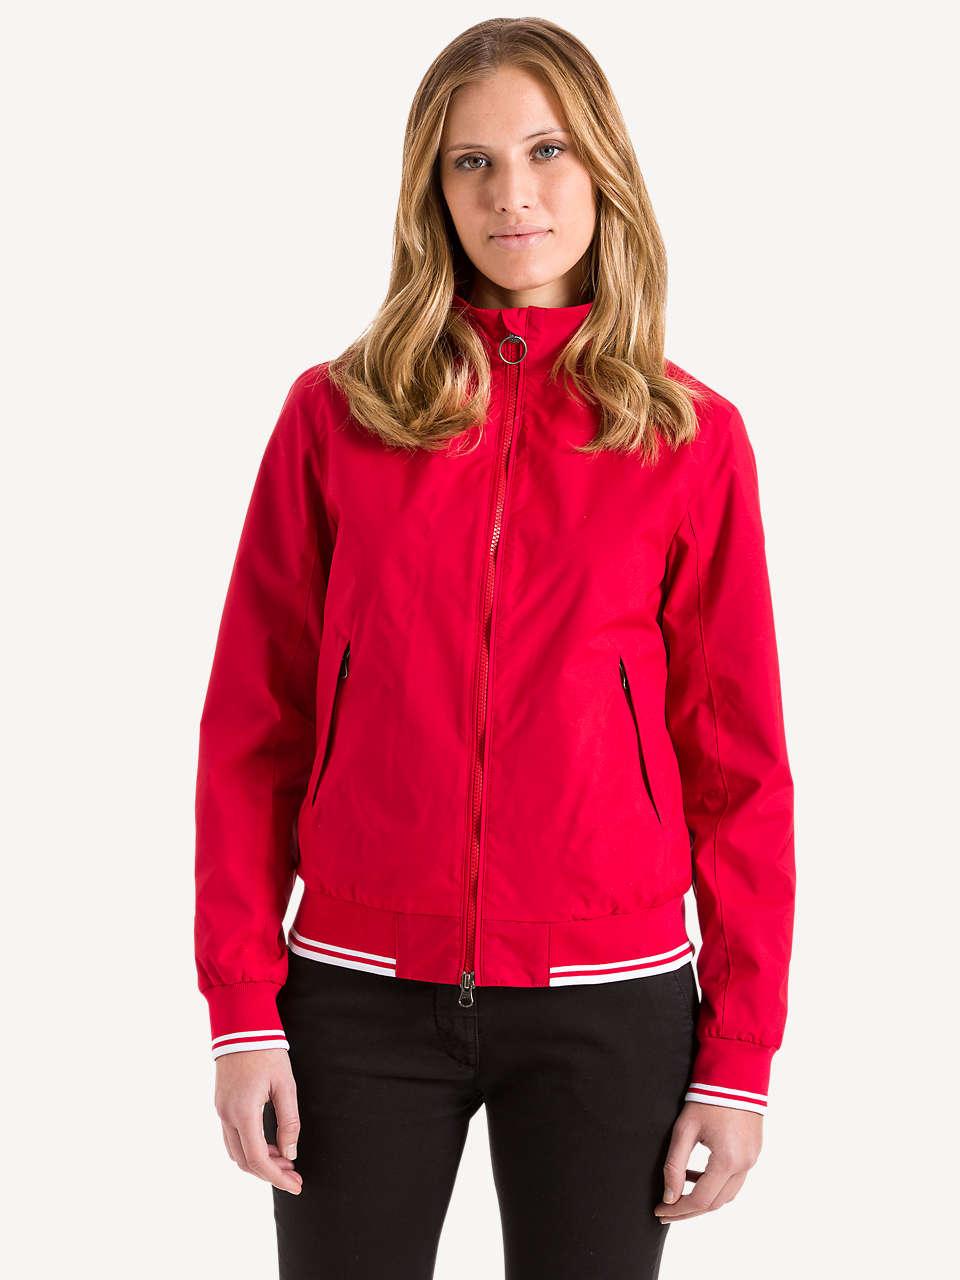 Sailor Jacket